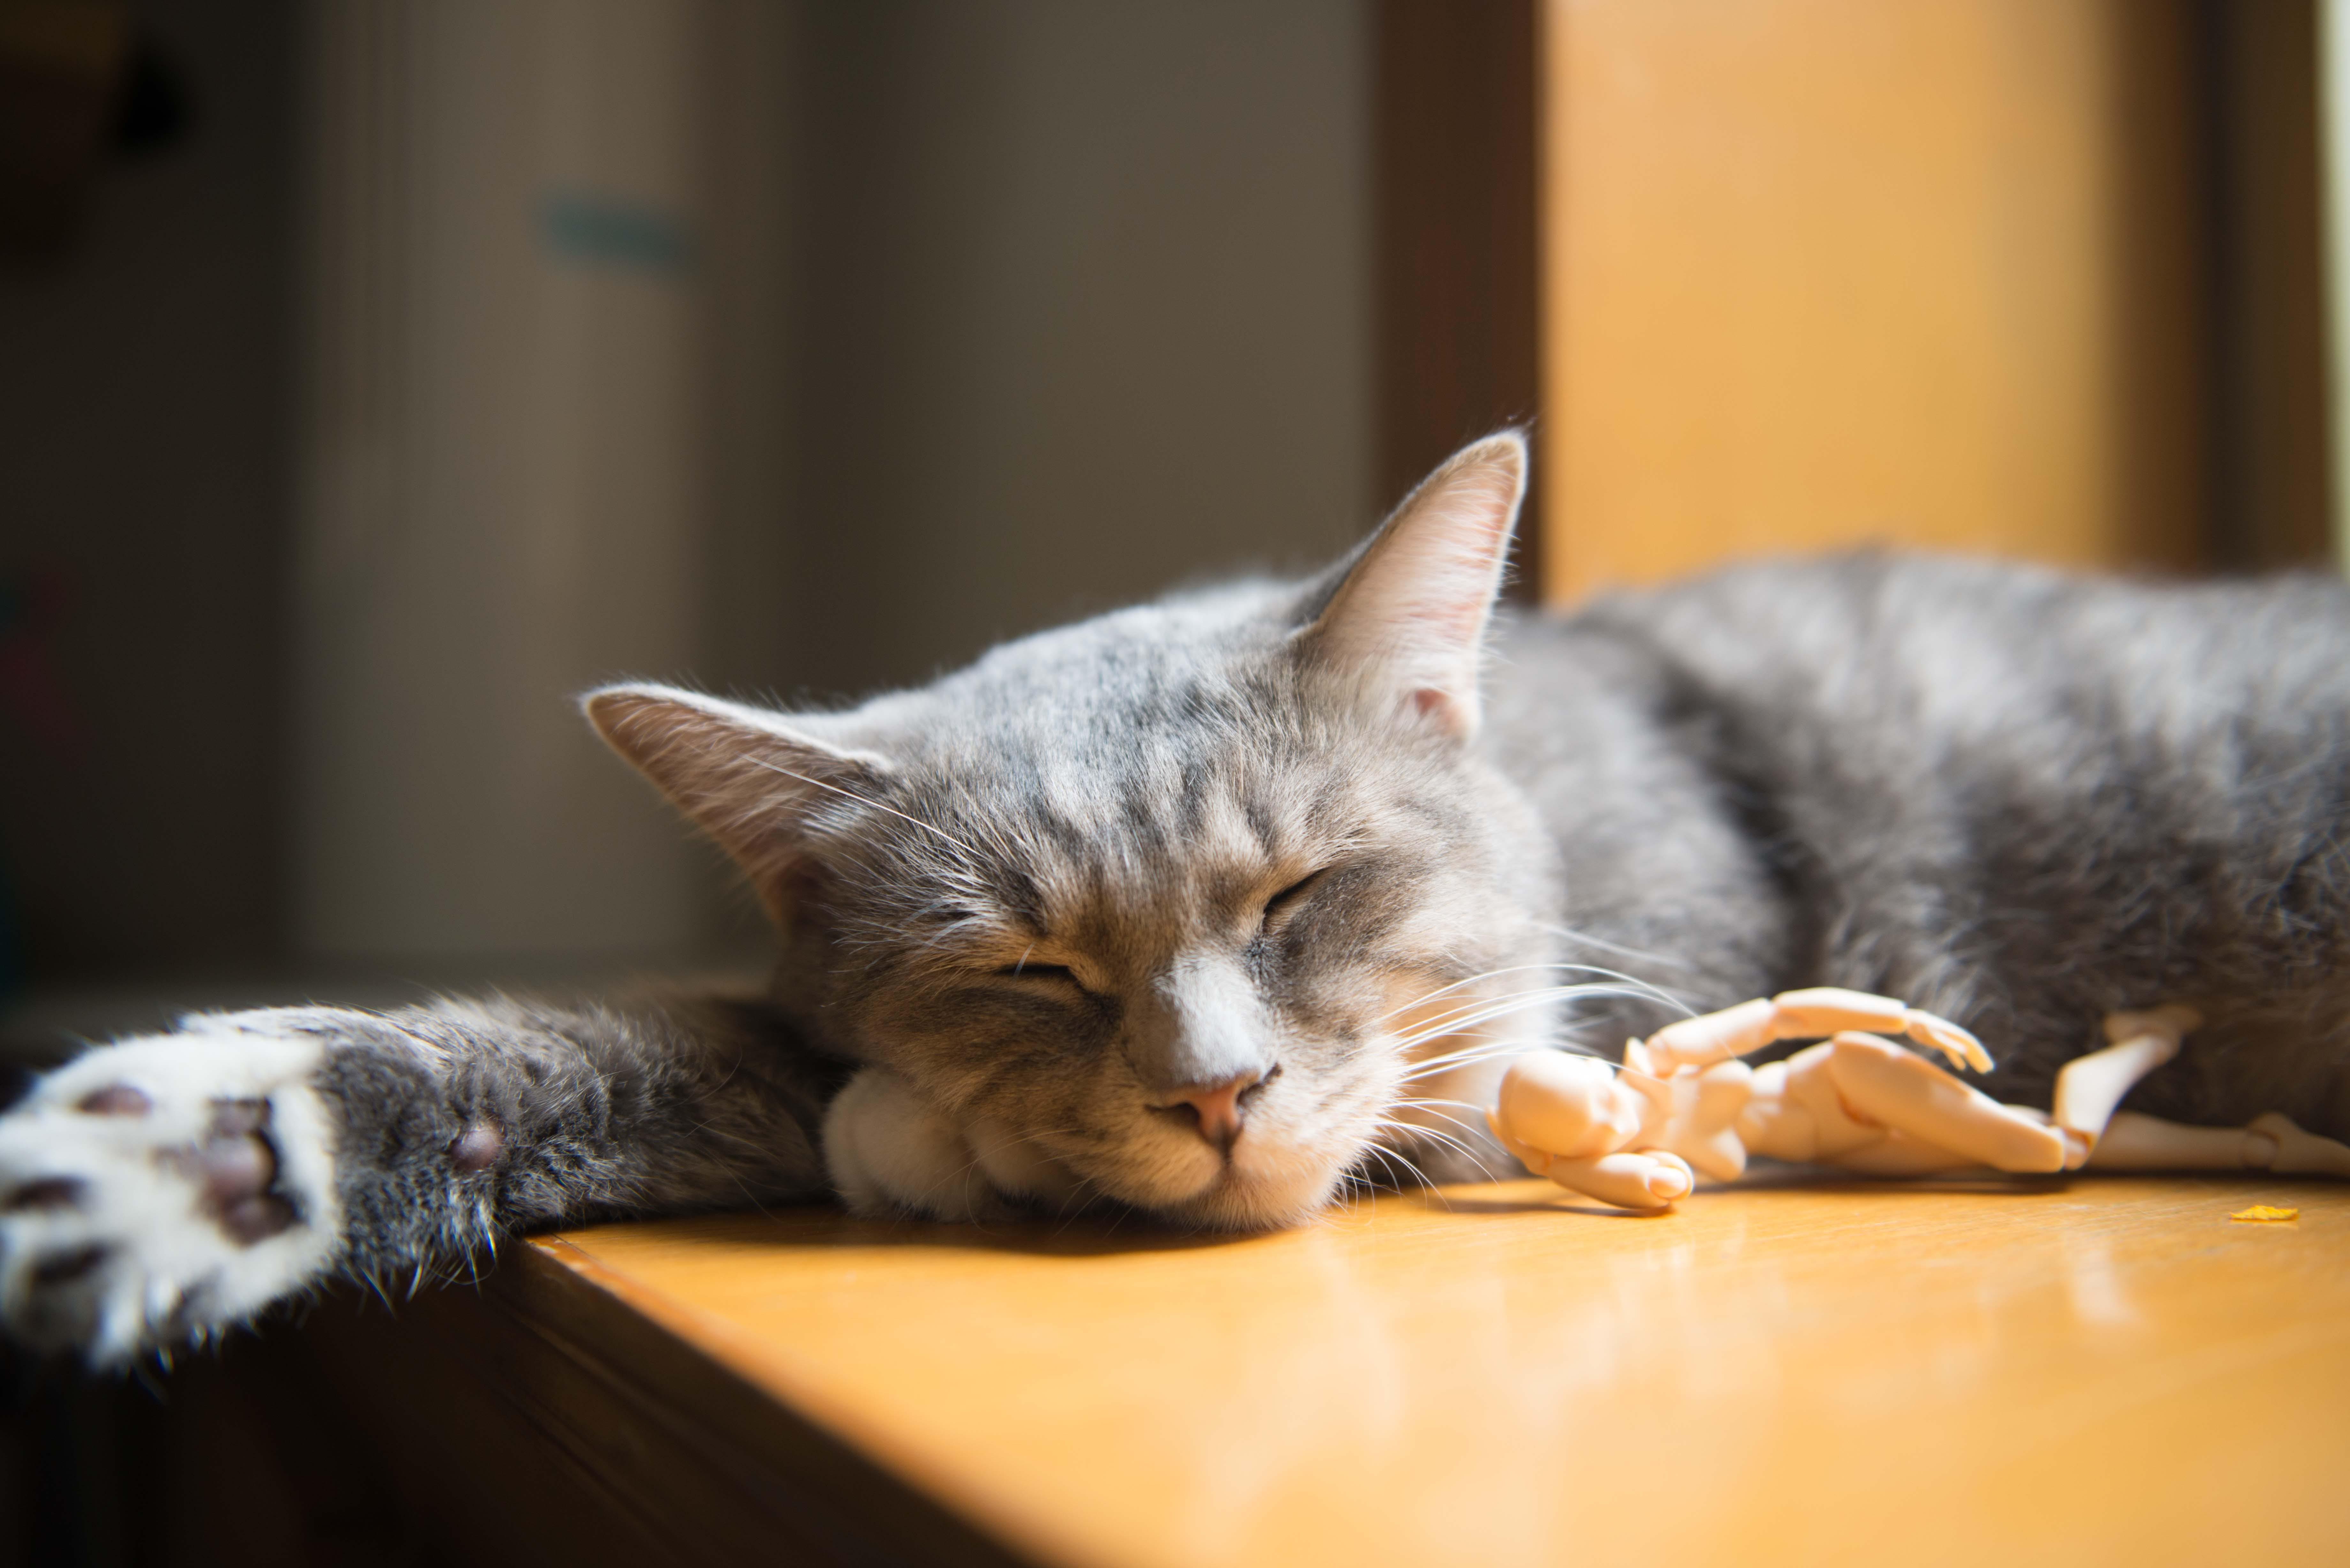 Foto stok gratis anak kucing, bayi, belum tua, berbulu halus